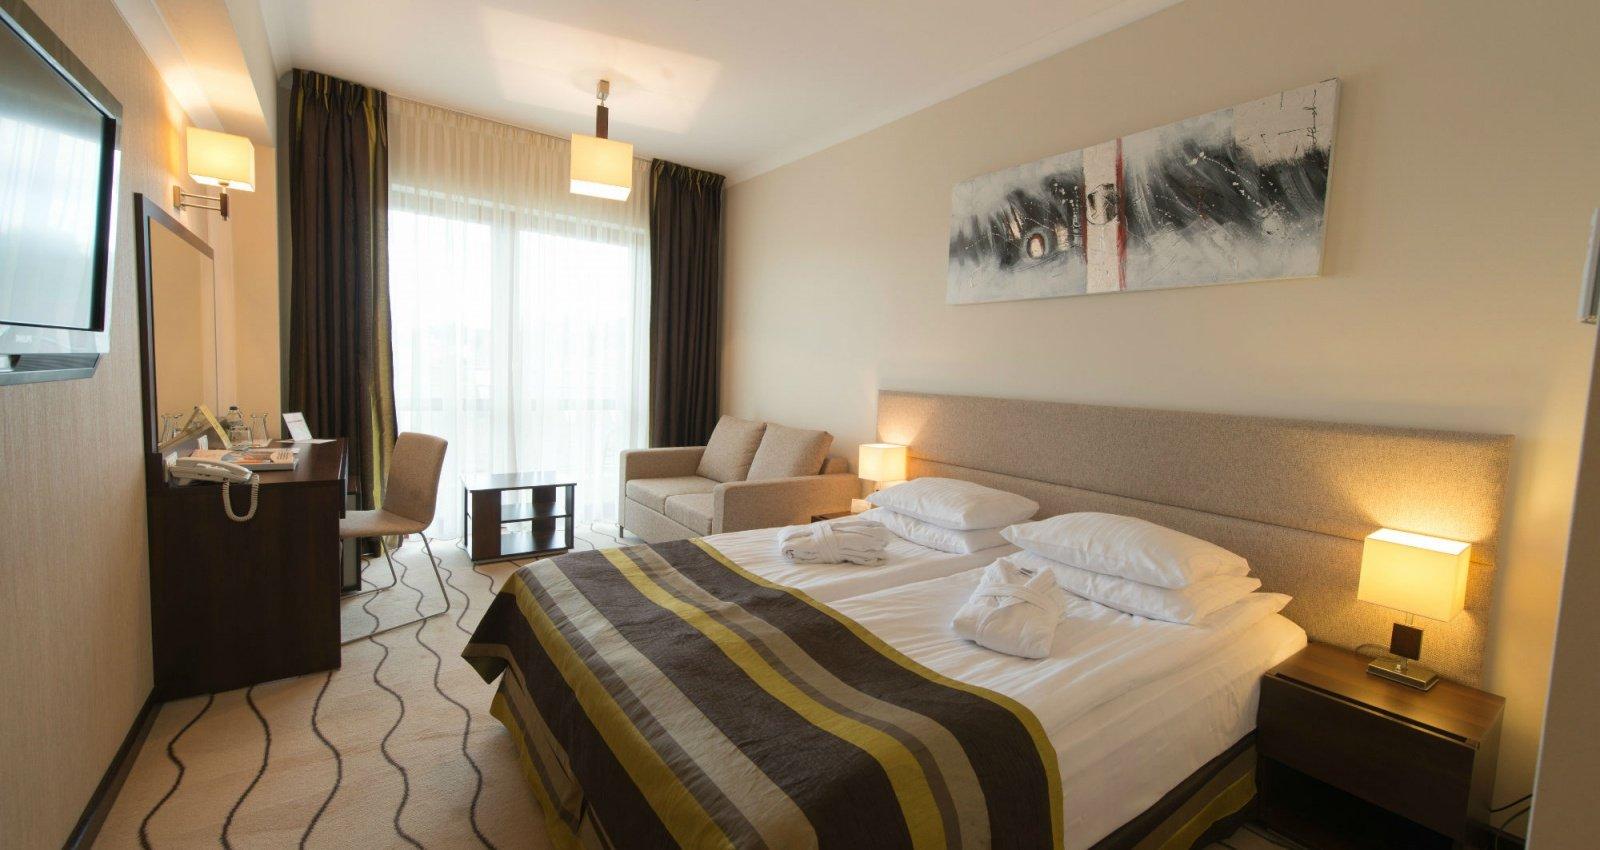 http://u.profitroom.pl/hotelleda.pl/thumb/1600x850/uploads/Pokoje/dsc_0719.jpg?size=stretch&mode=crop